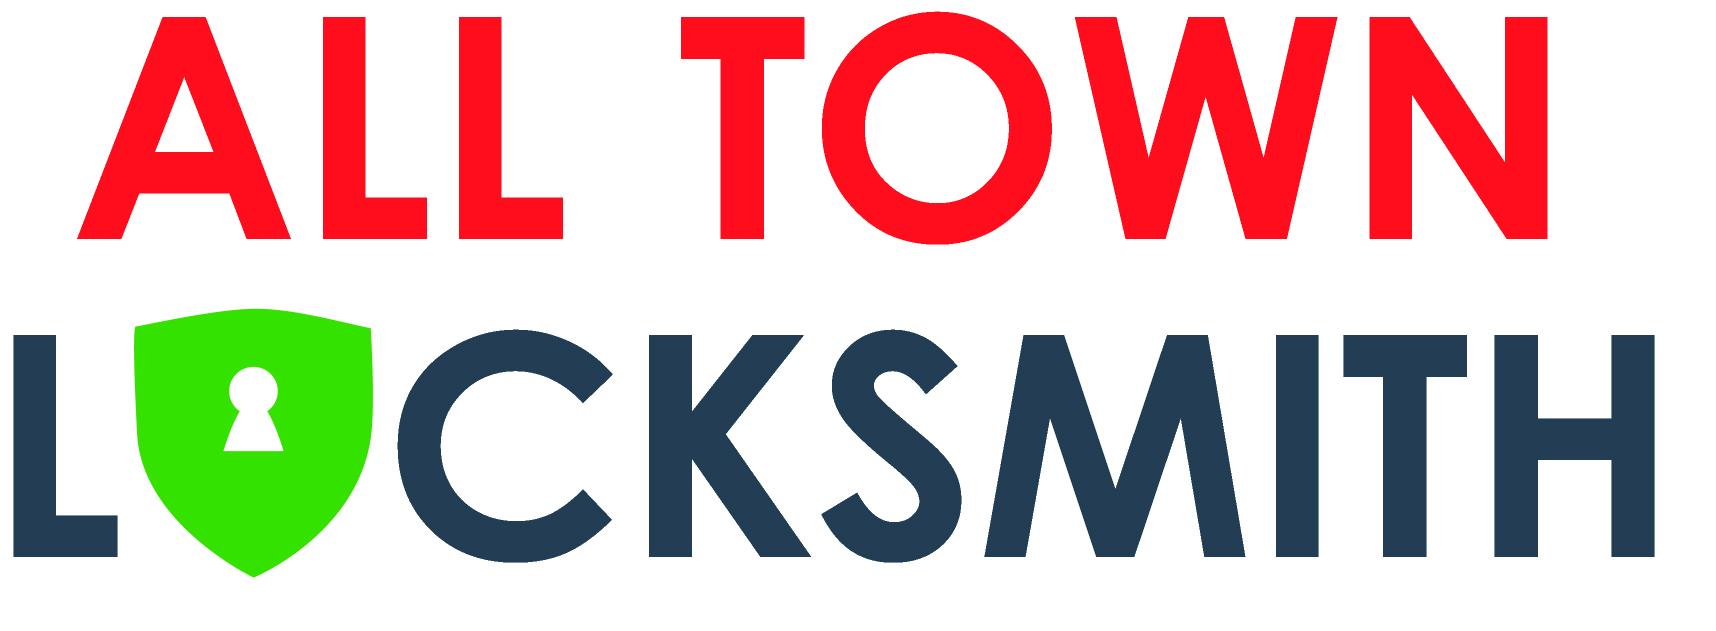 All Town Locksmith for Car Key Programming in Miami, FL